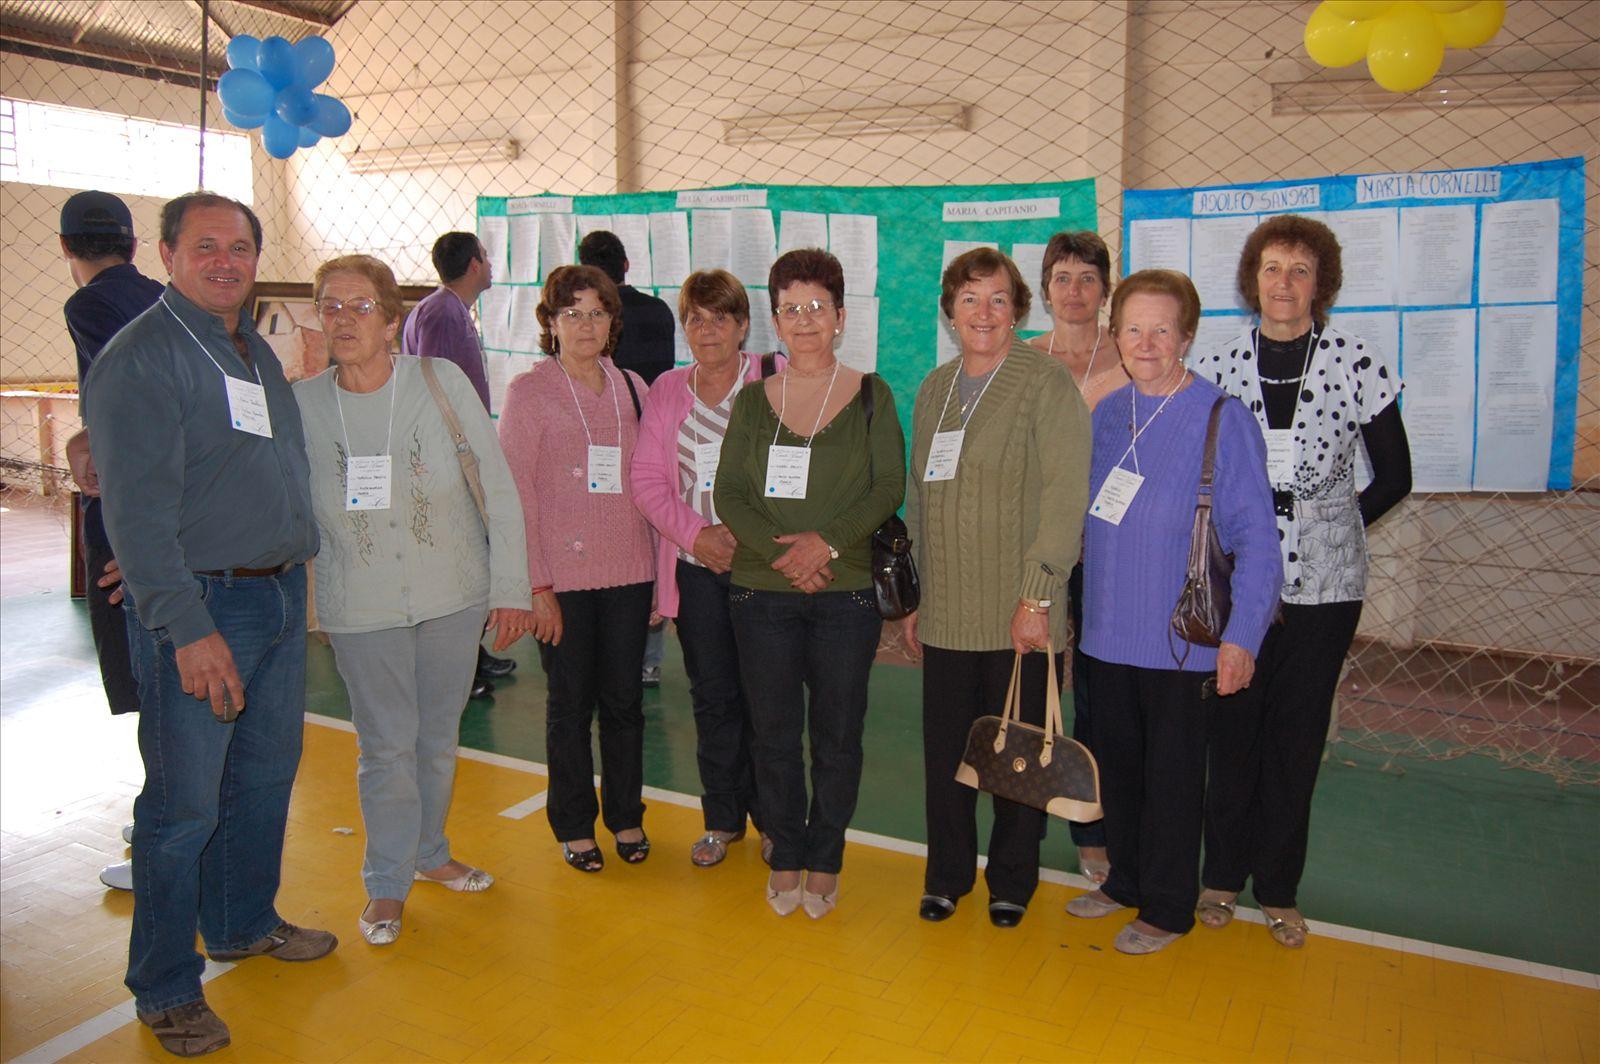 2º Encontro Família Cornelli - 11.10.2009 (63)_0